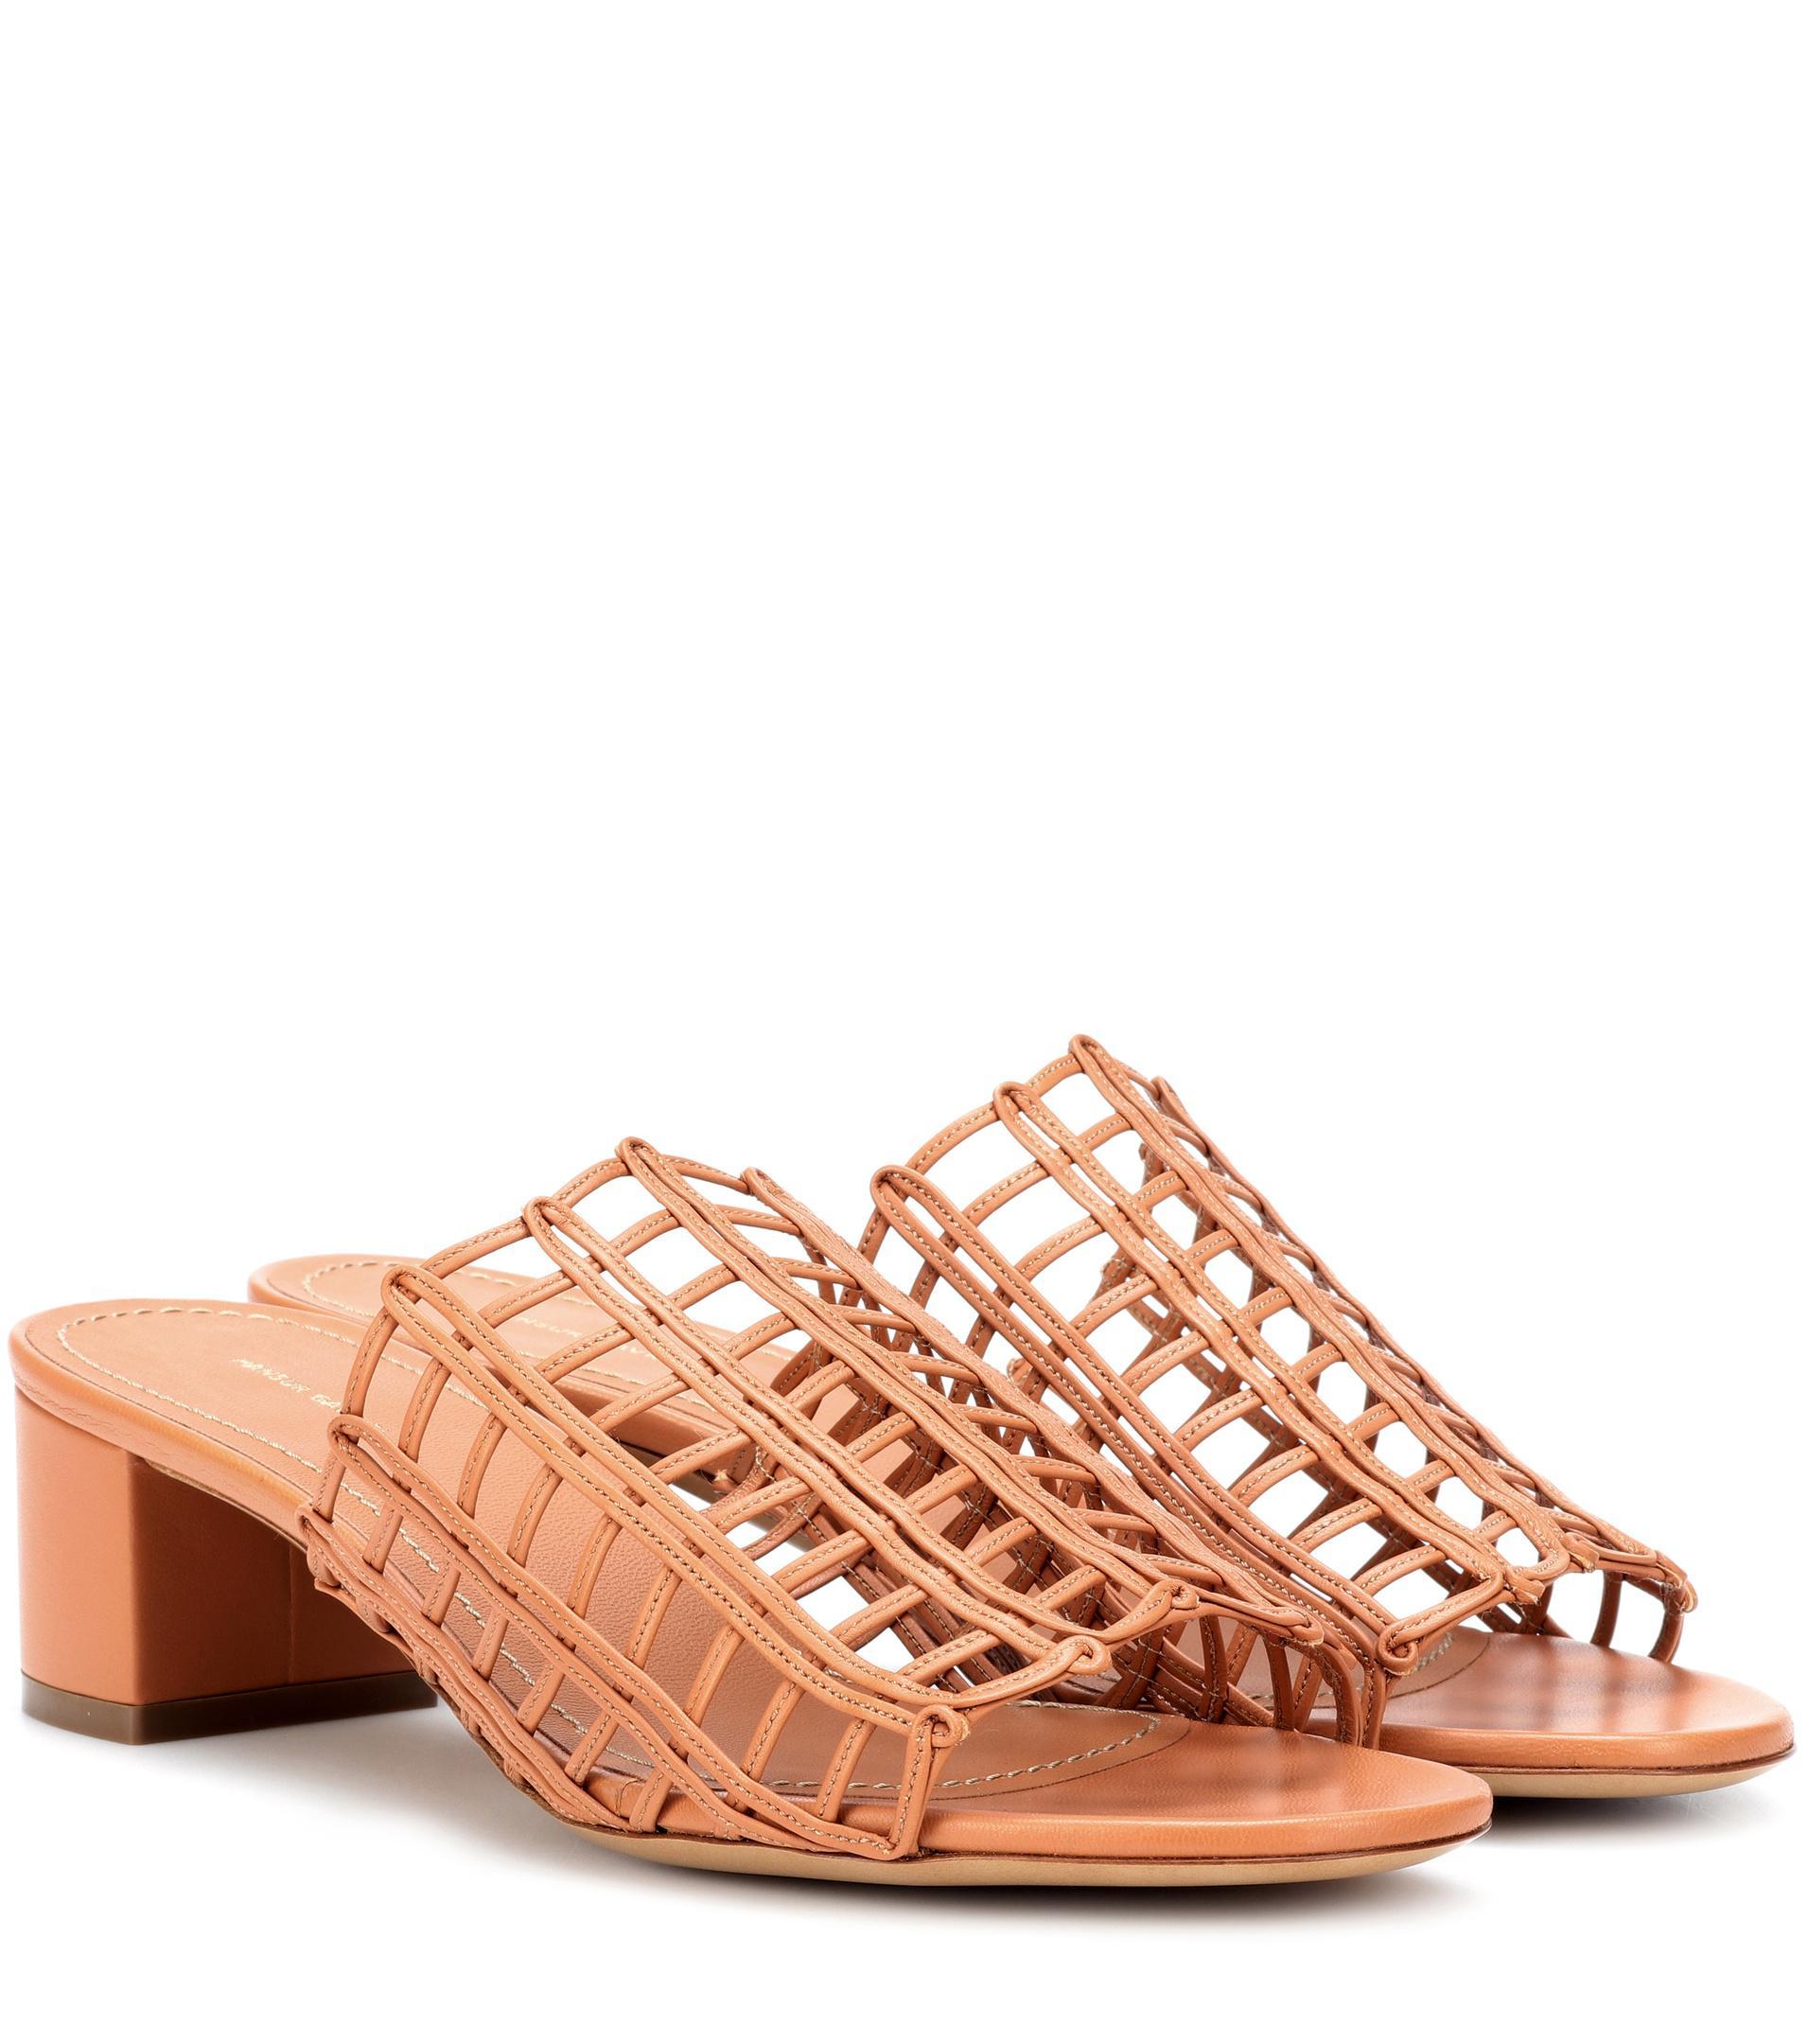 Mansur Gavriel Grid leather sandals k1ItYGJ1T